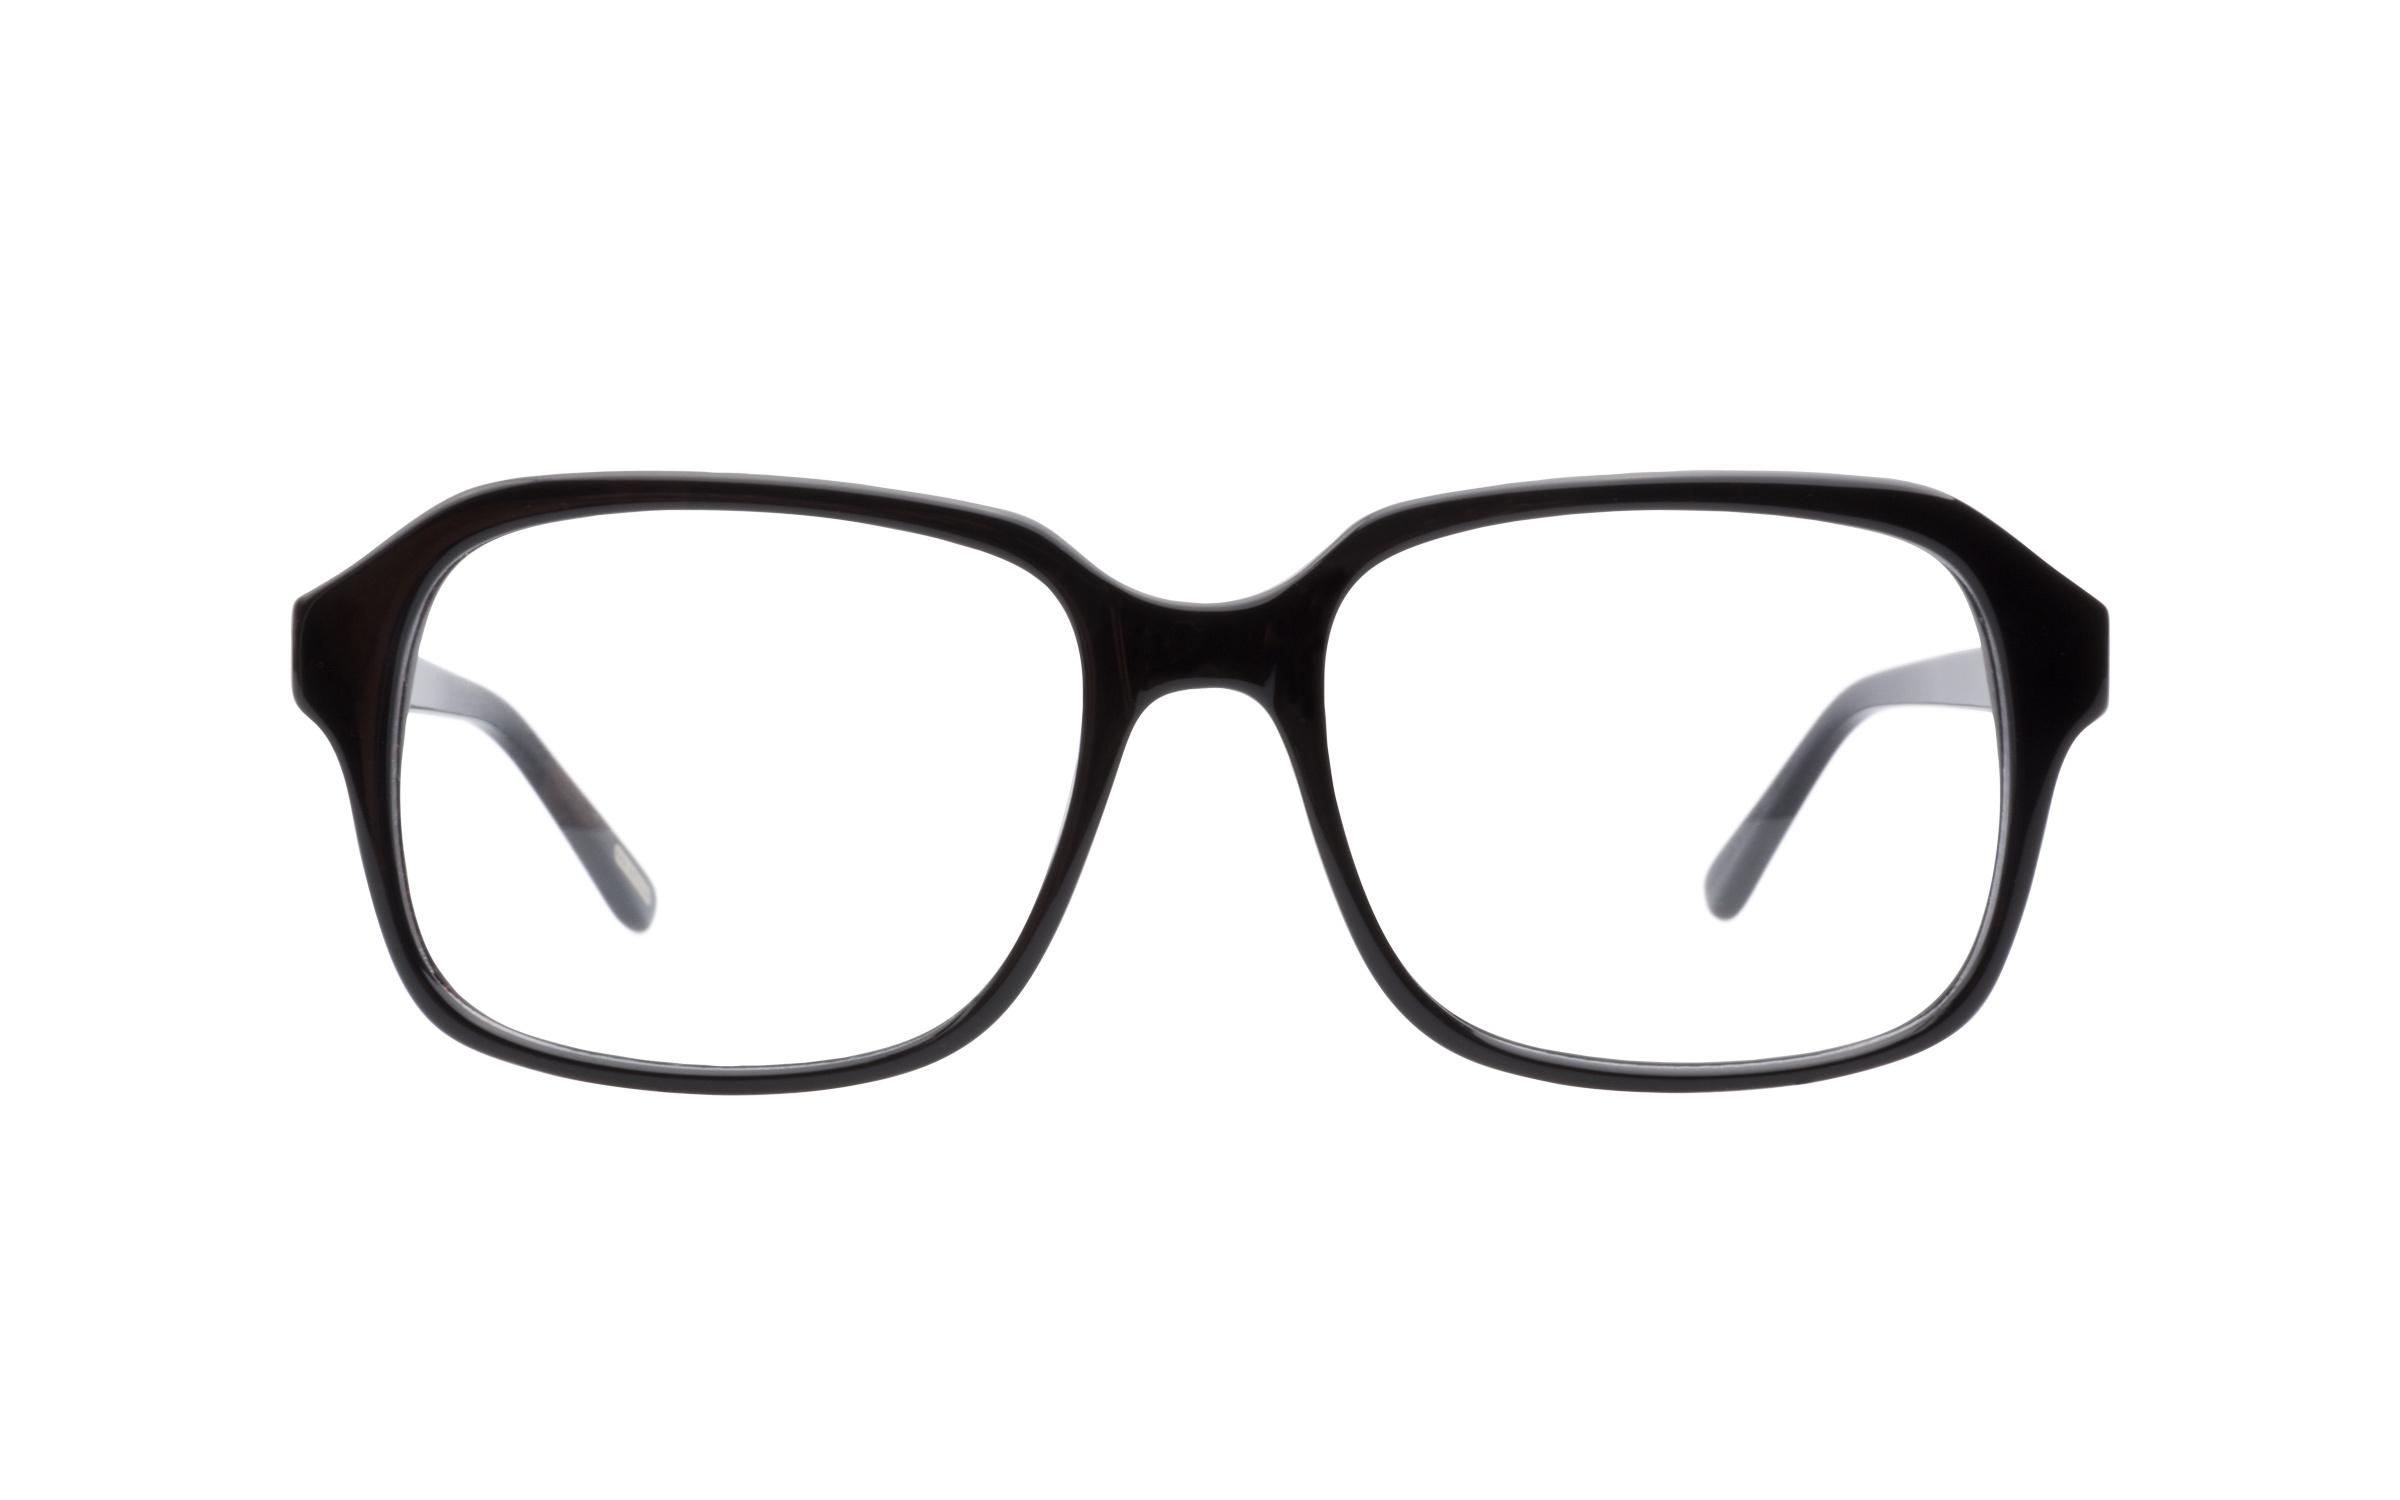 Womens_Retro_Glasses_Black_Kam_Dhillon_Online_Coastal